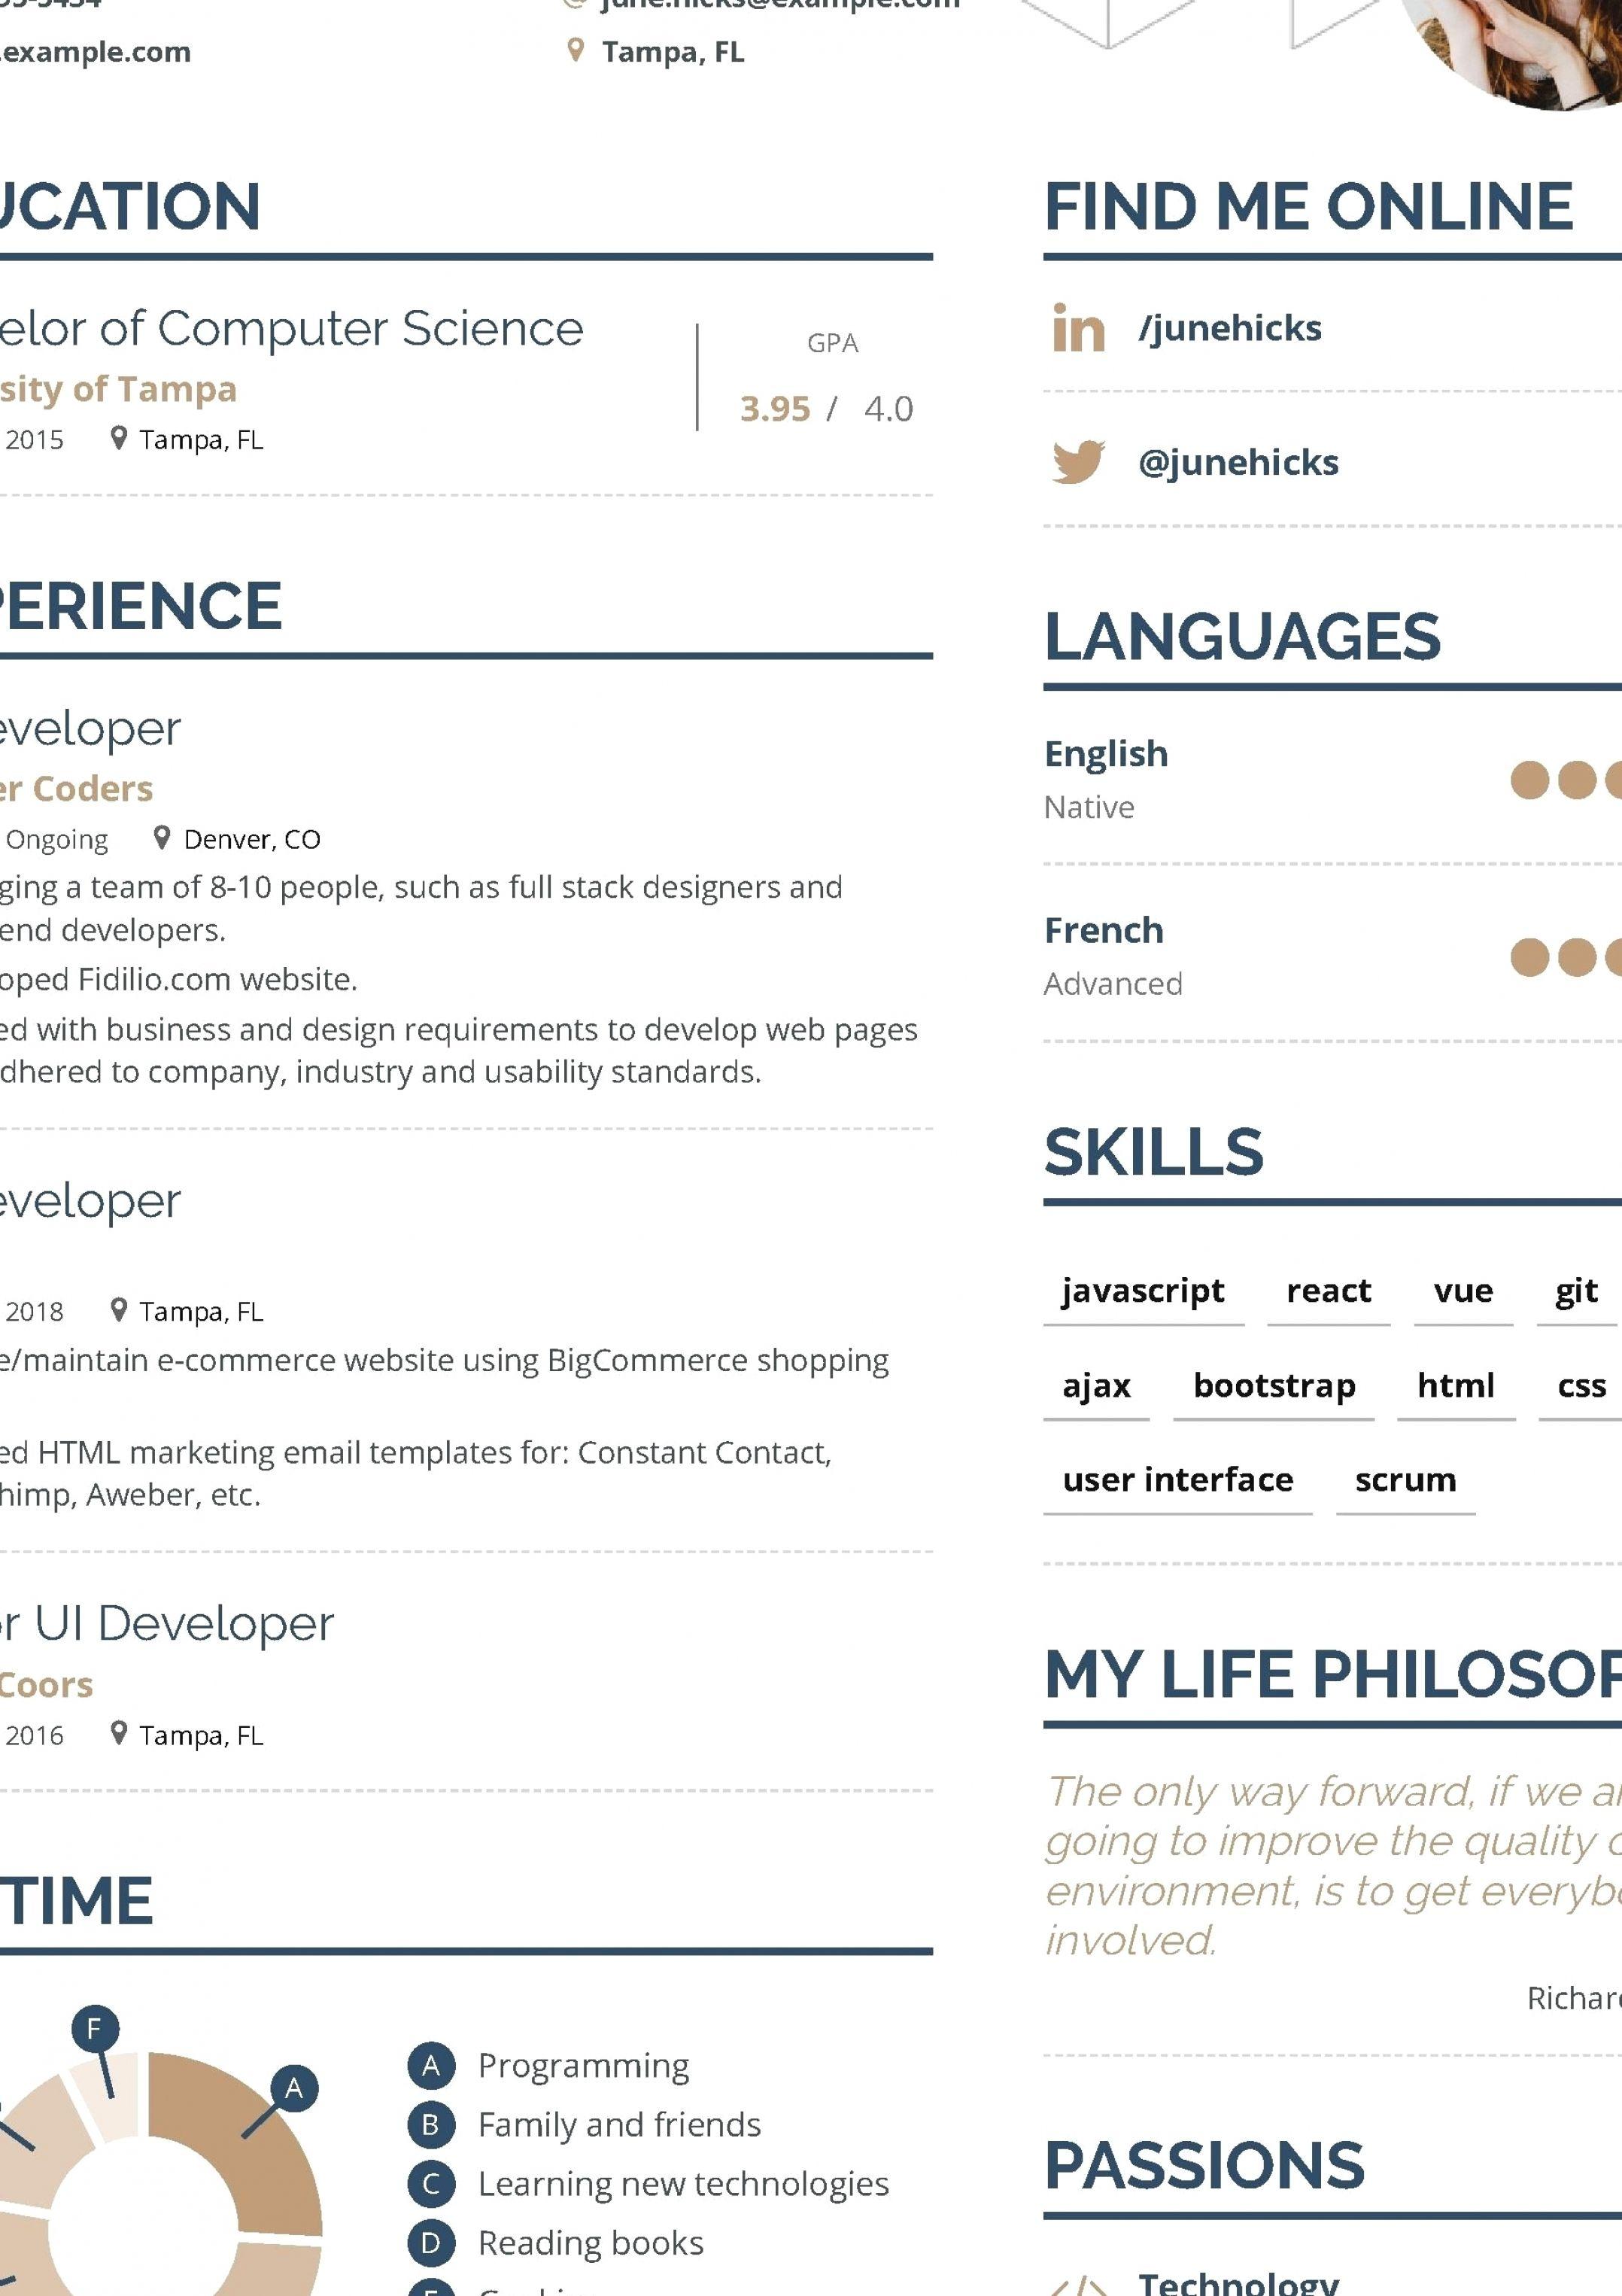 100 Professional Resume Samples For 2020 Resumekraft Professional Resume Samples Reading Comprehension Resume Templates